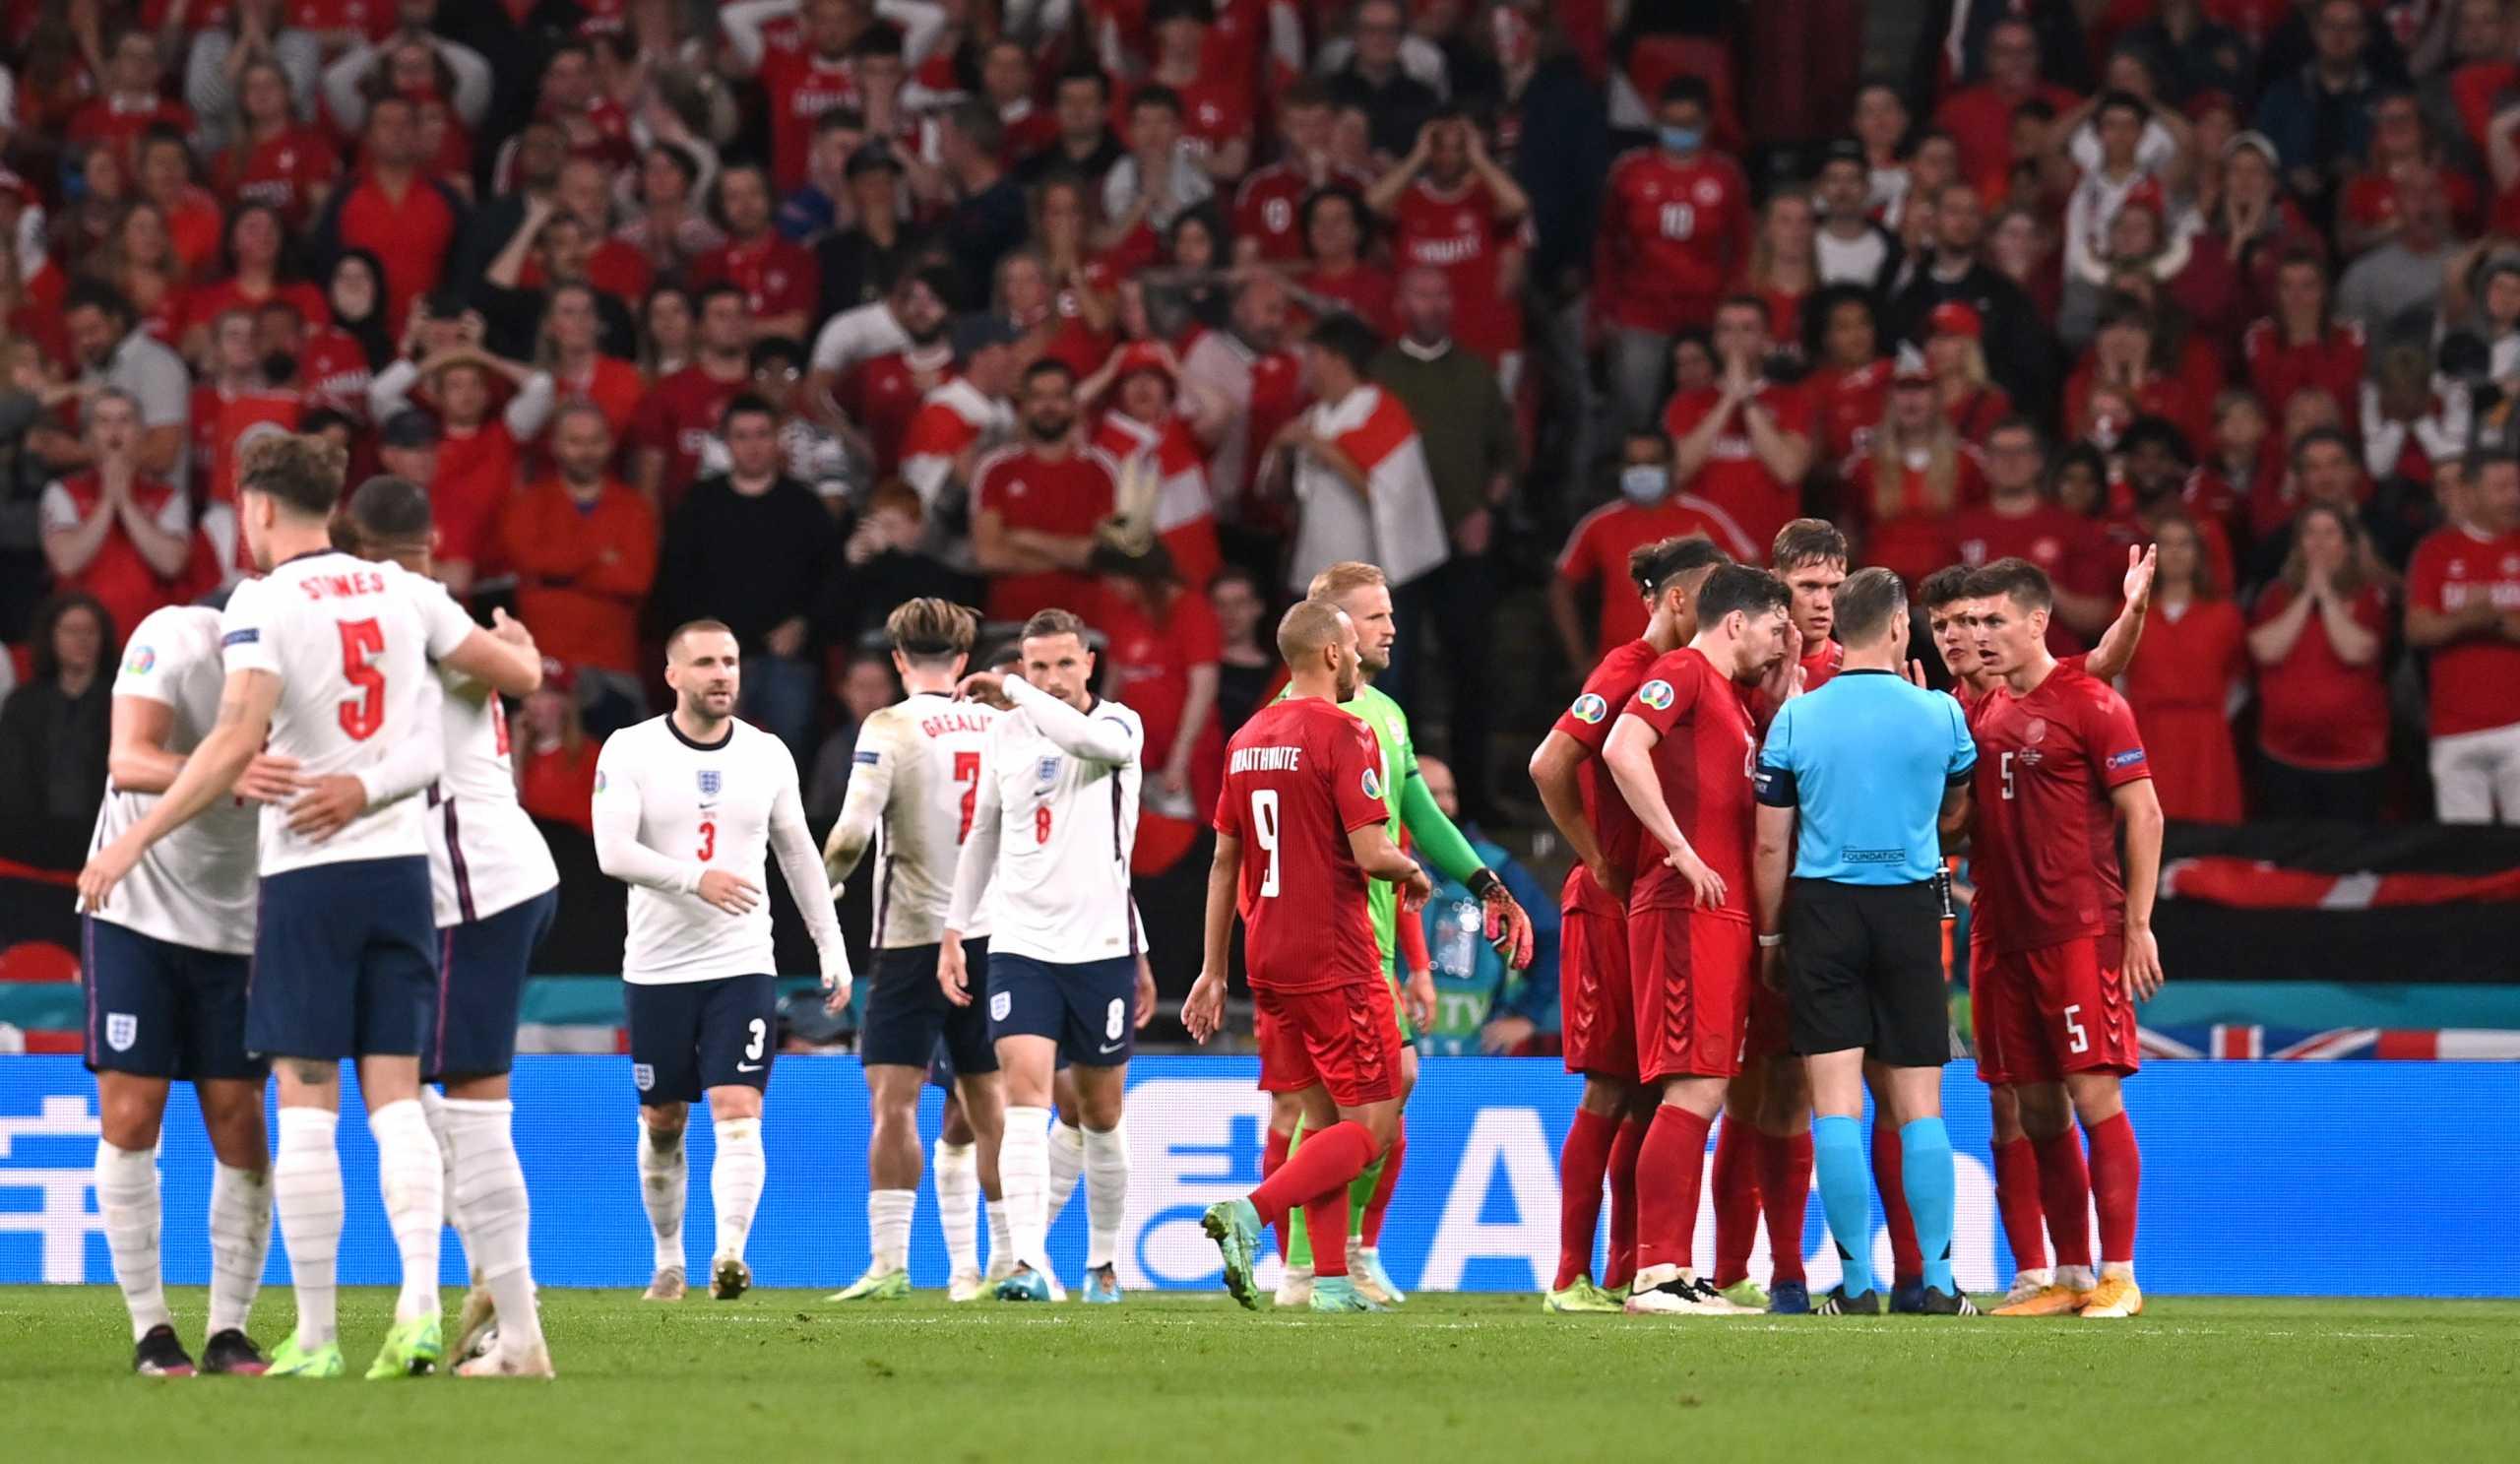 Euro 2020: Διαδικτυακό «γλέντι» στους Άγγλους για το πέναλτι με τη Δανία